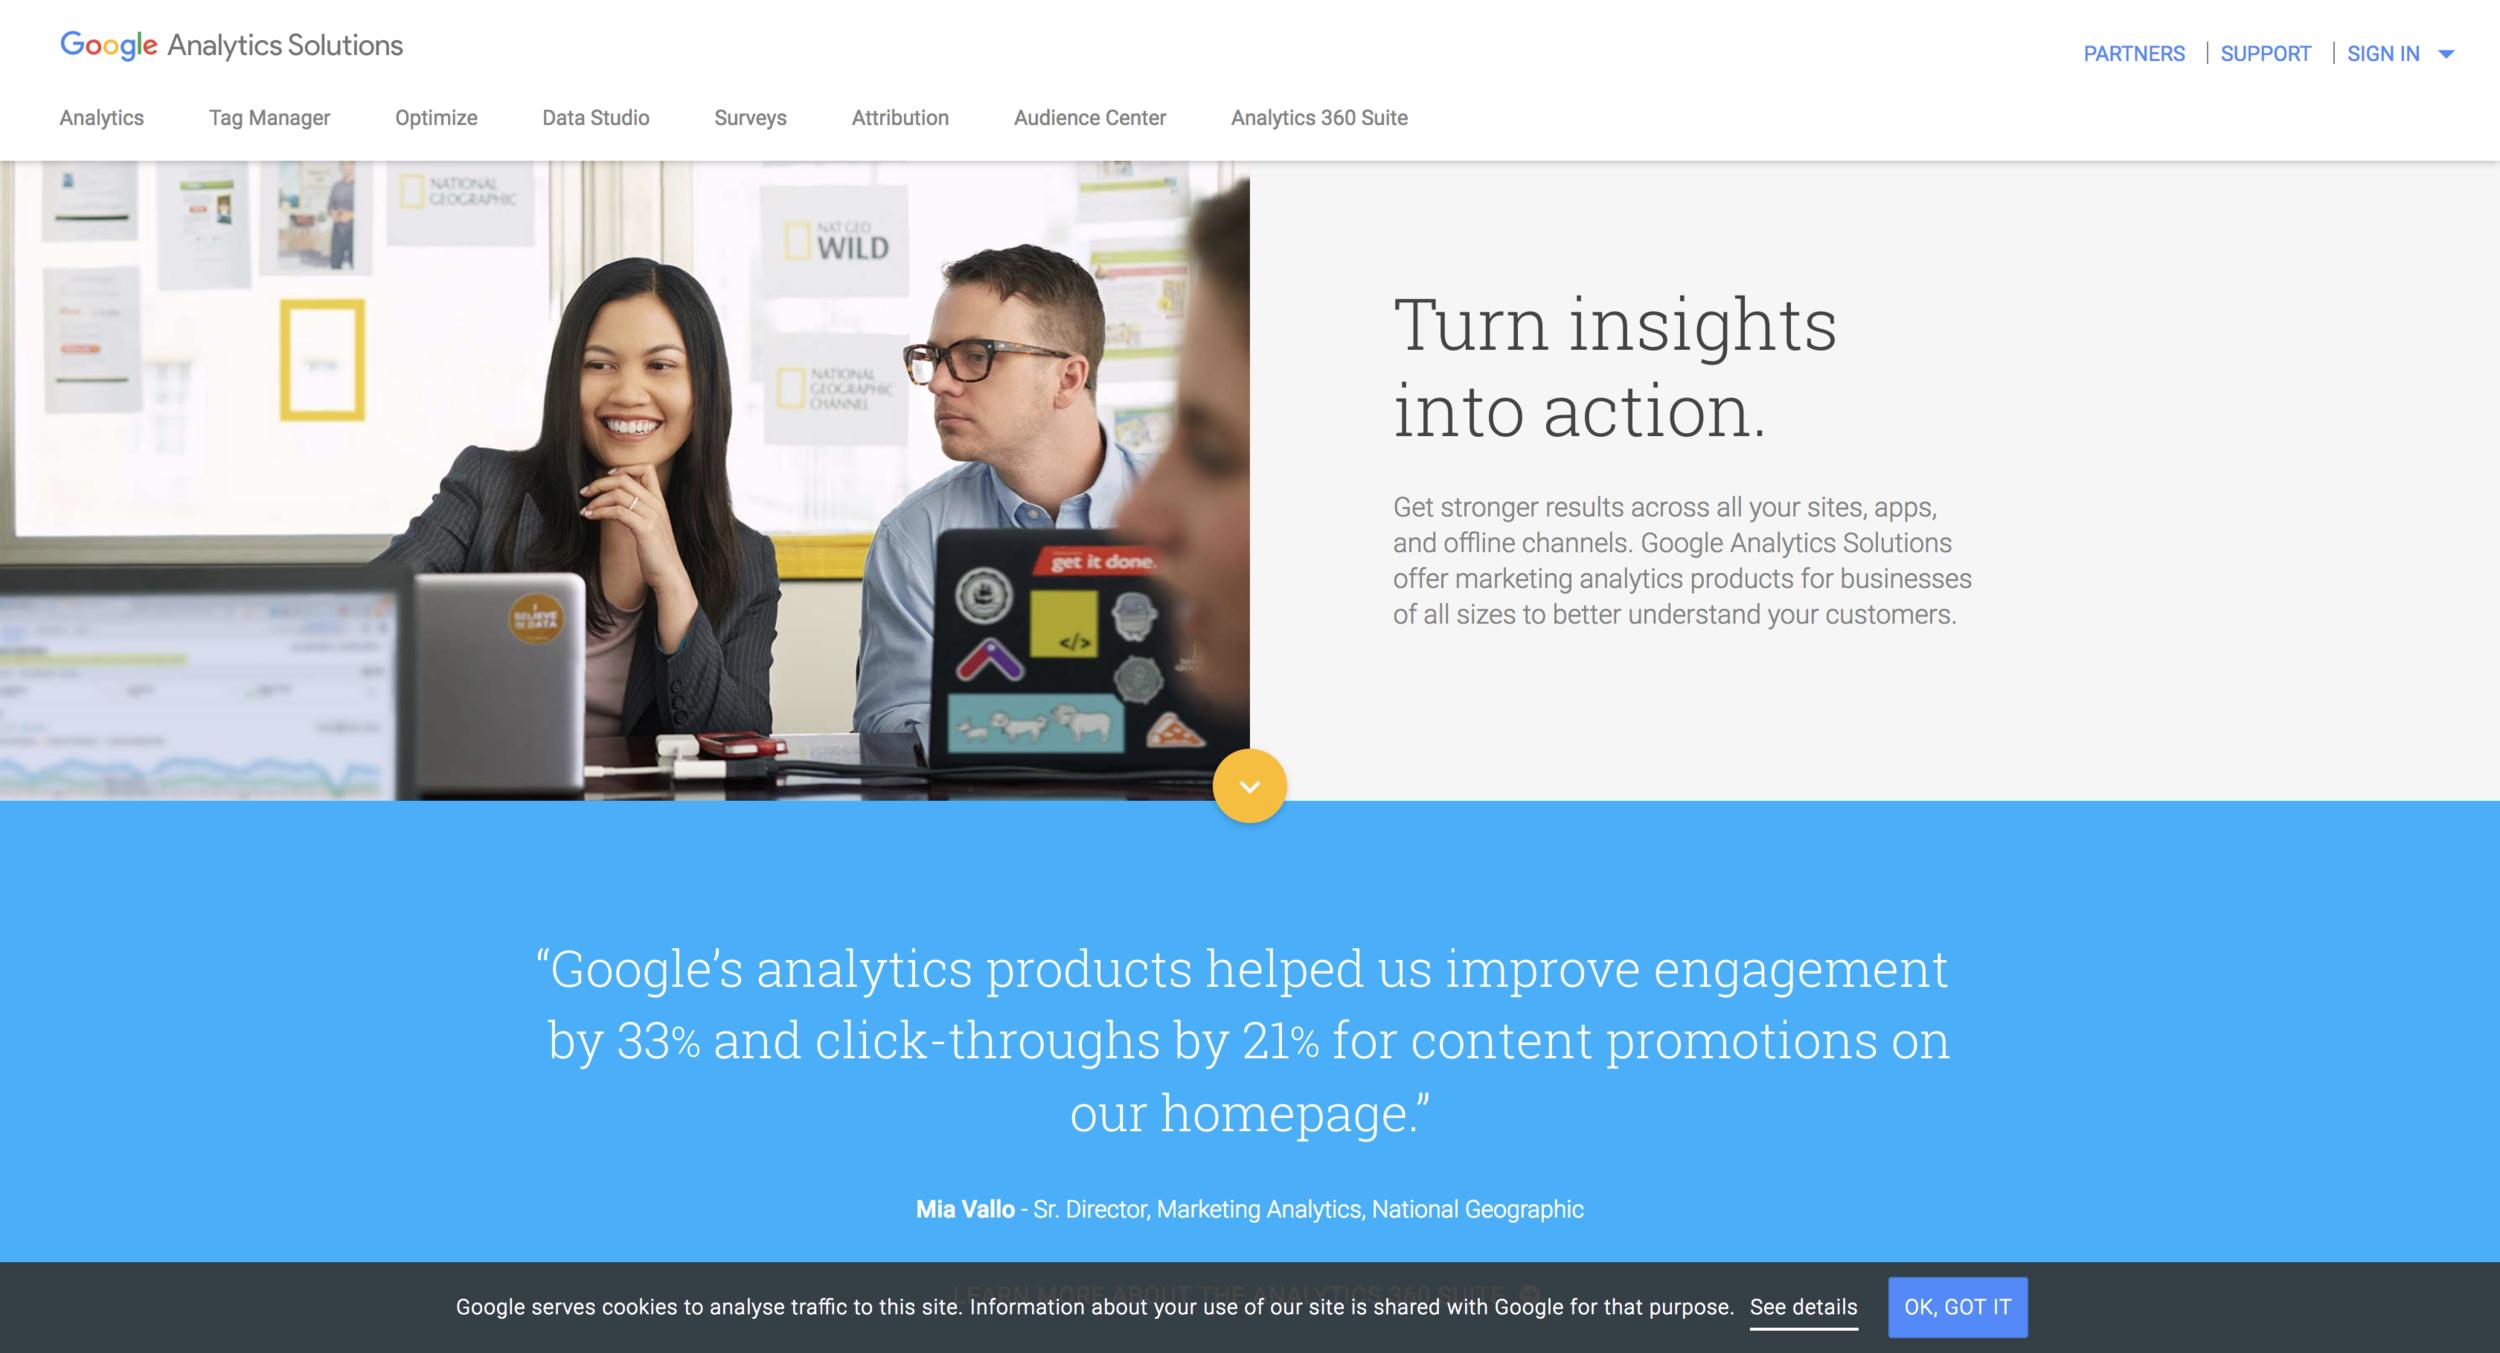 FireShot Capture 34 - Google Analytics Solutions - Marketing A_ - https___www.google.com_analytics_#.png